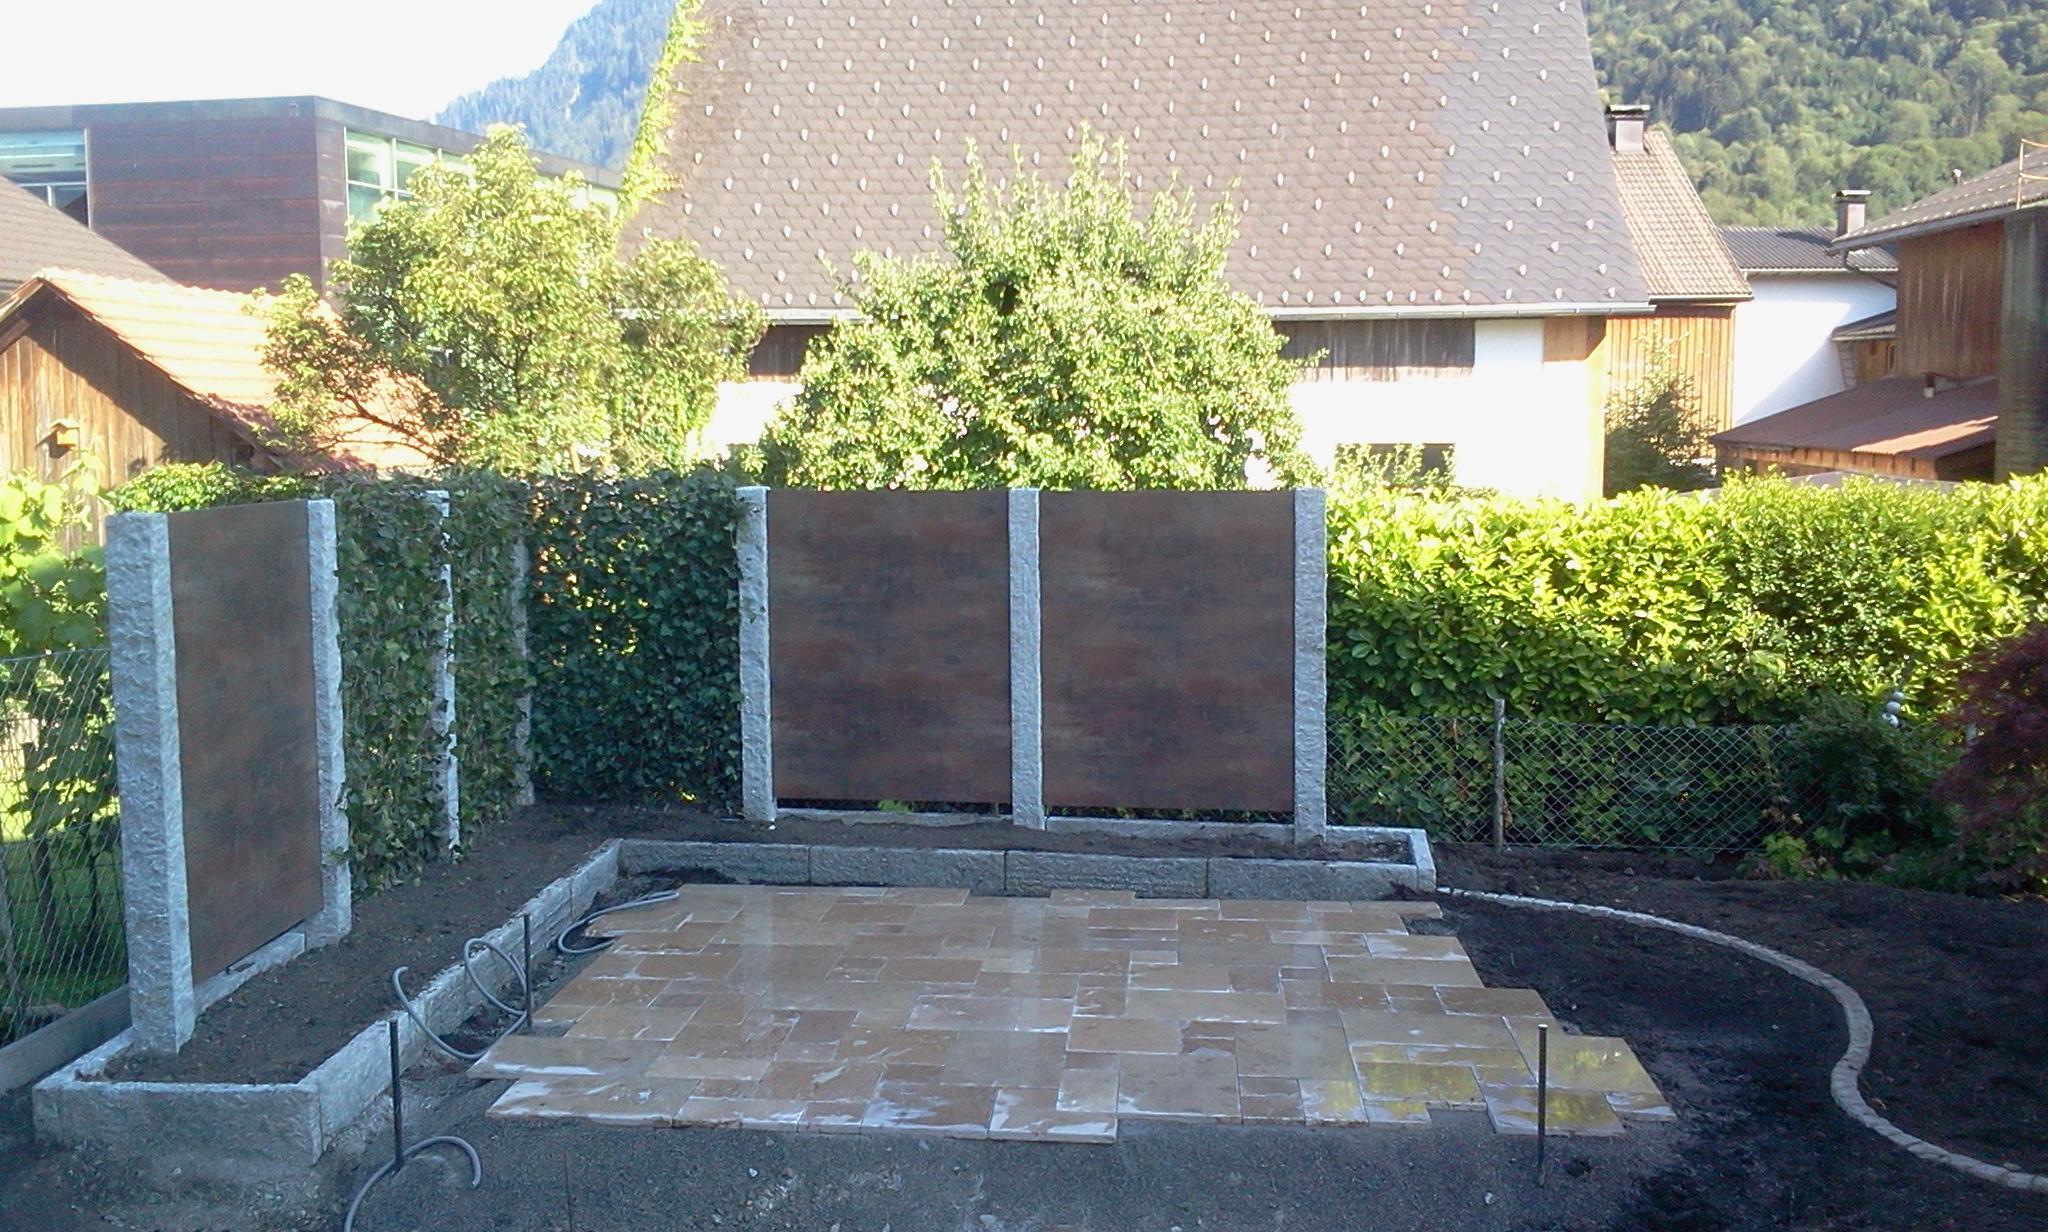 Emejing gartengestaltung mit granit ideas for Gartengestaltung granit